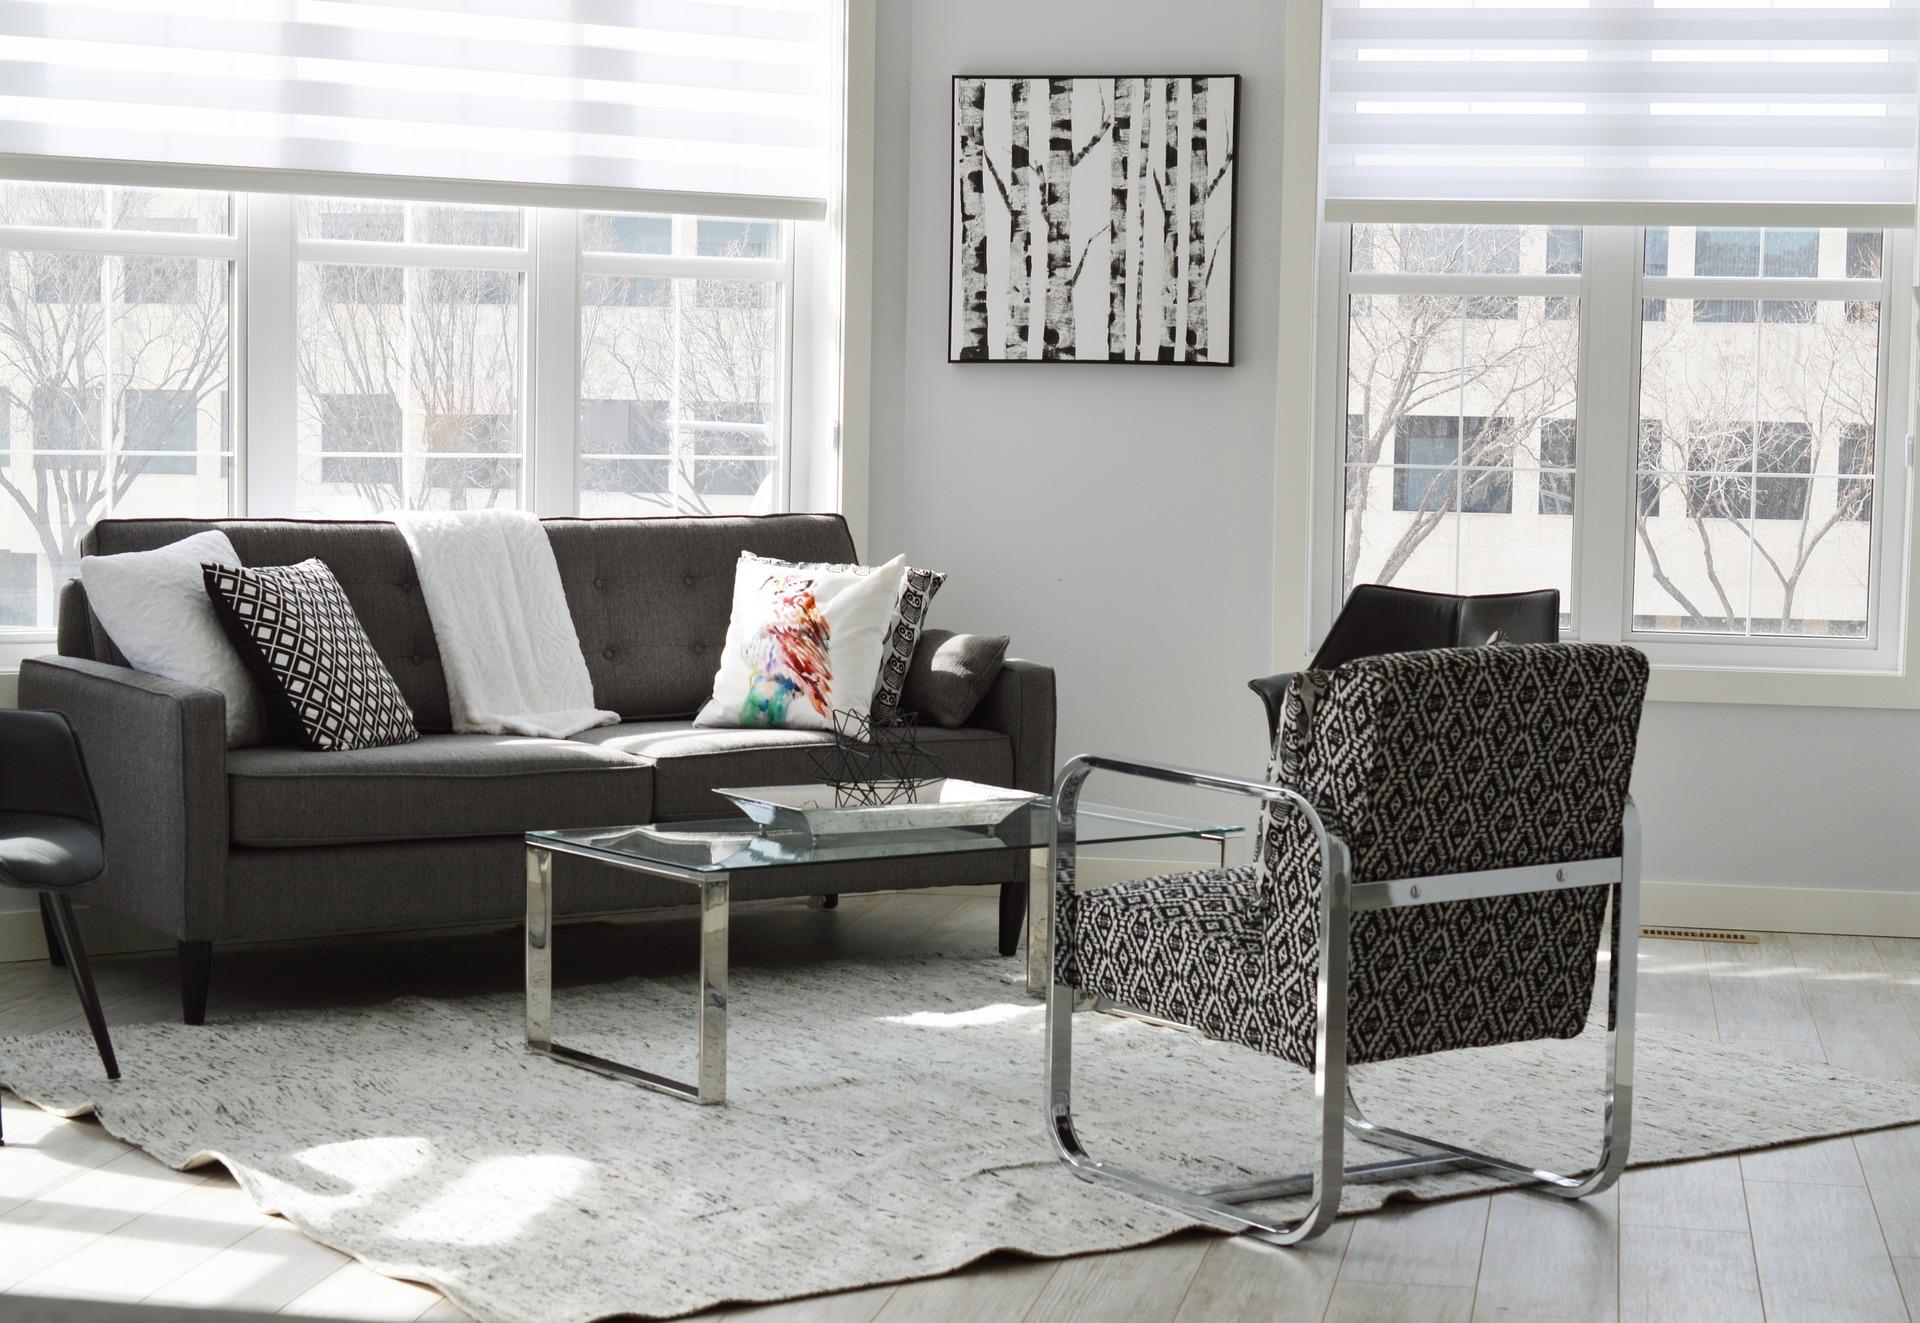 living-room-2155353_1920